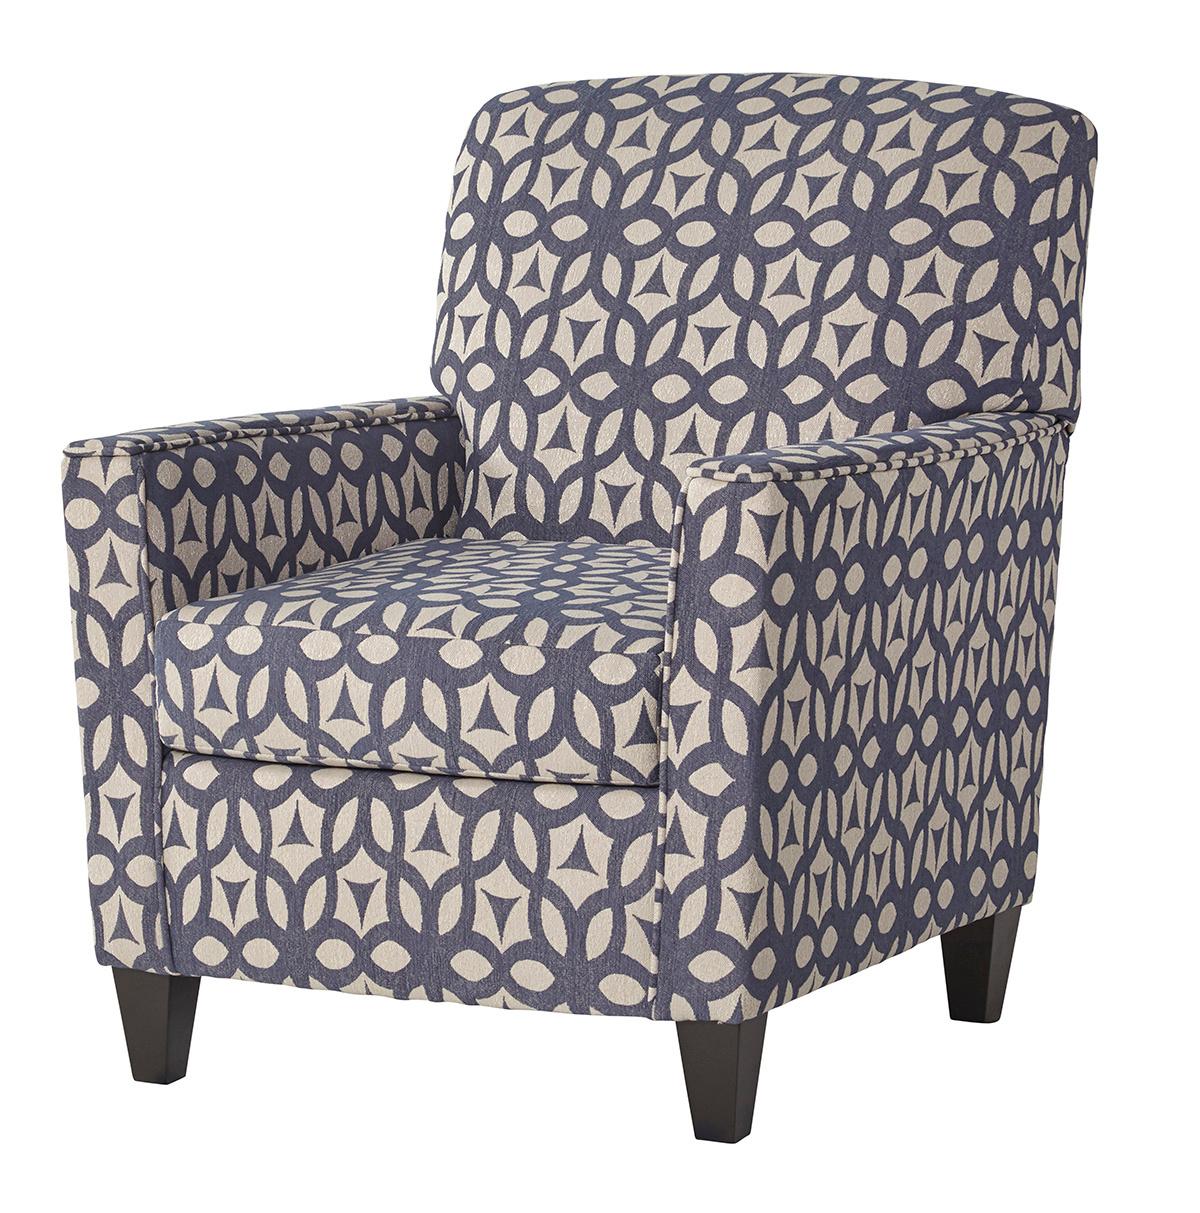 35FONA Serta Zccent Chair